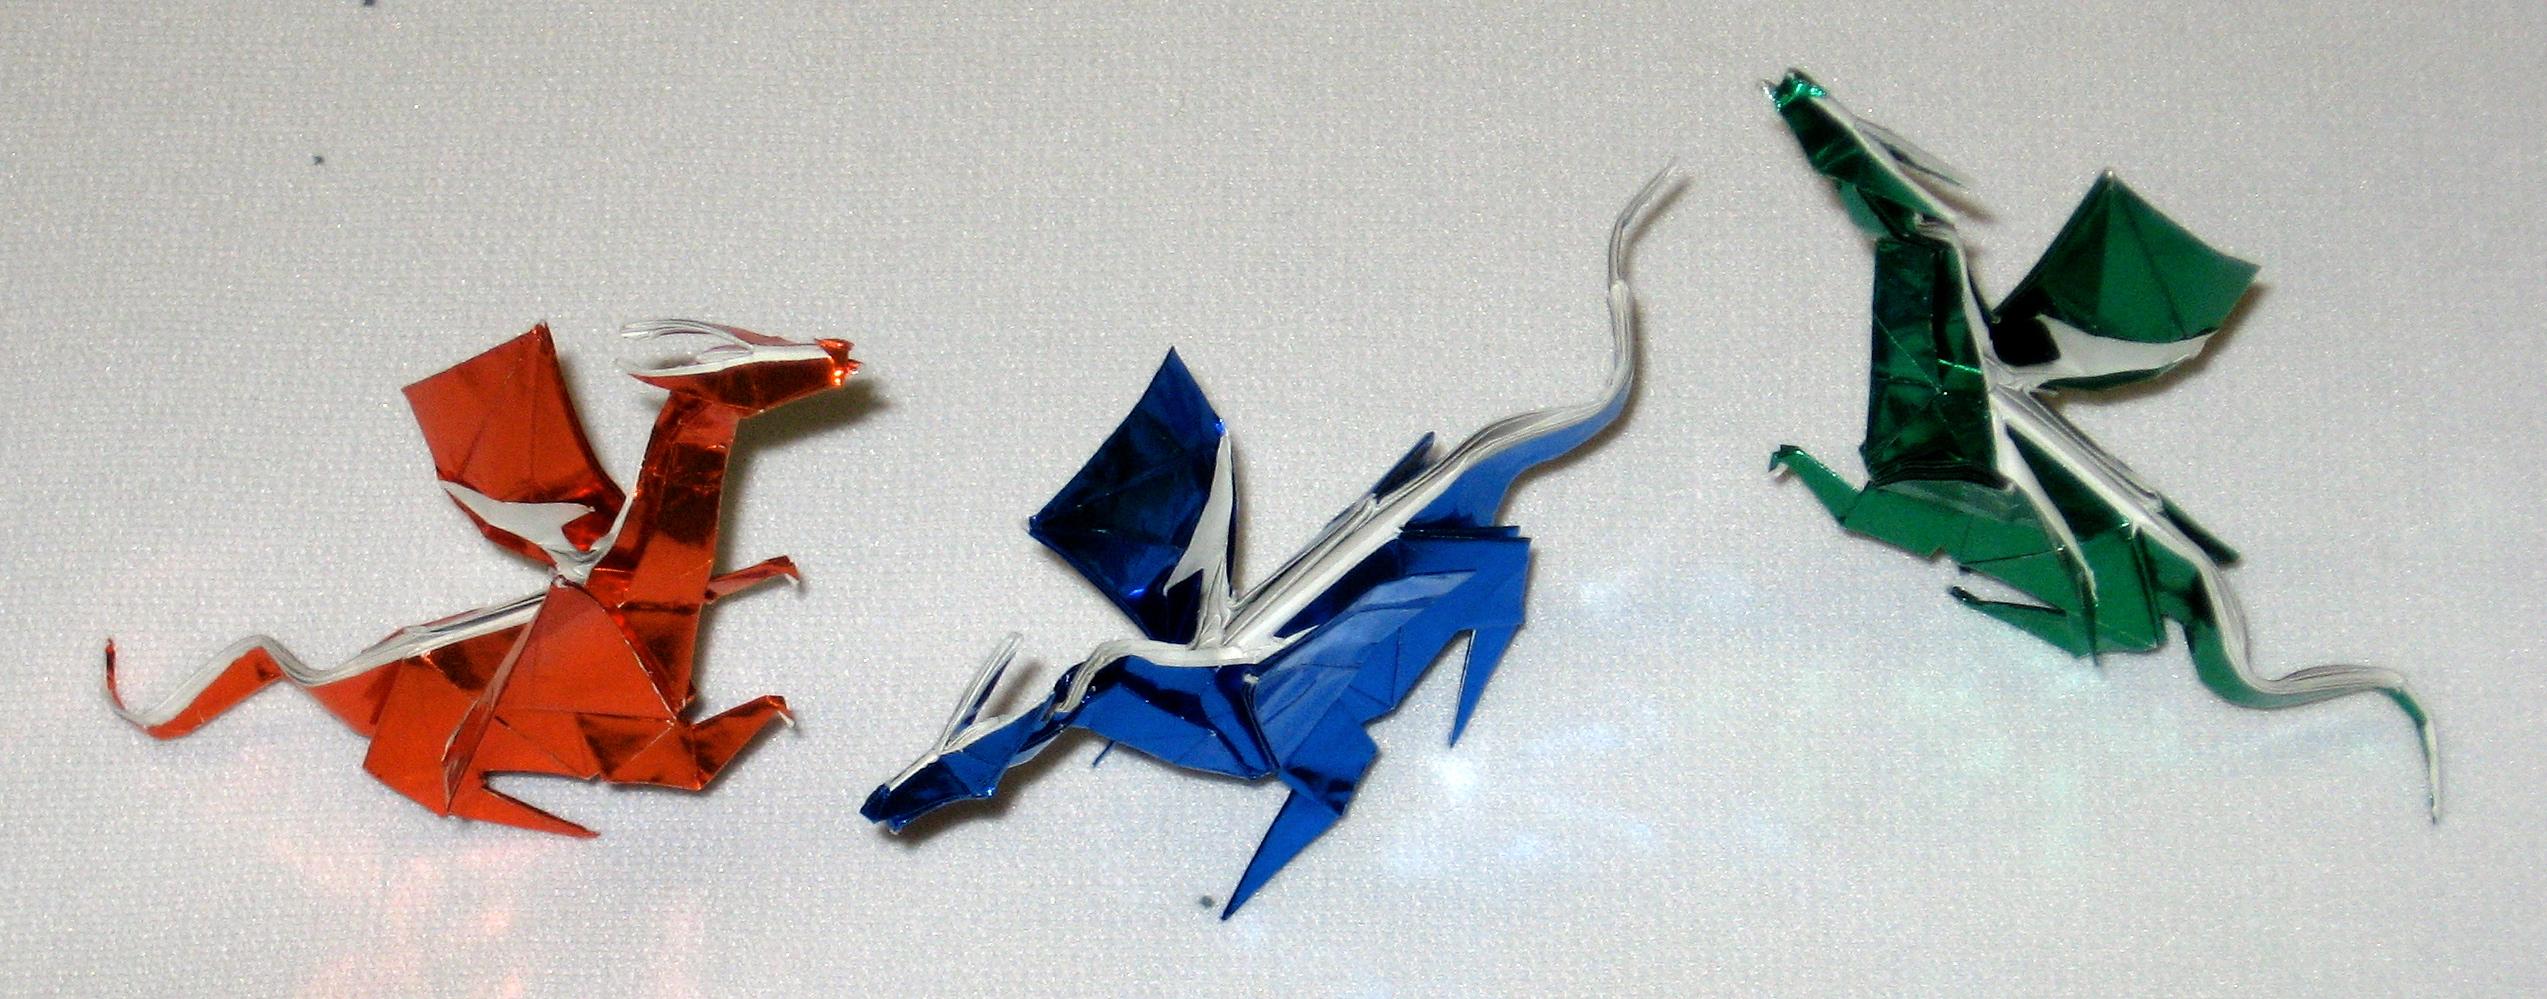 Origami Dragon – In Progress - photo#34